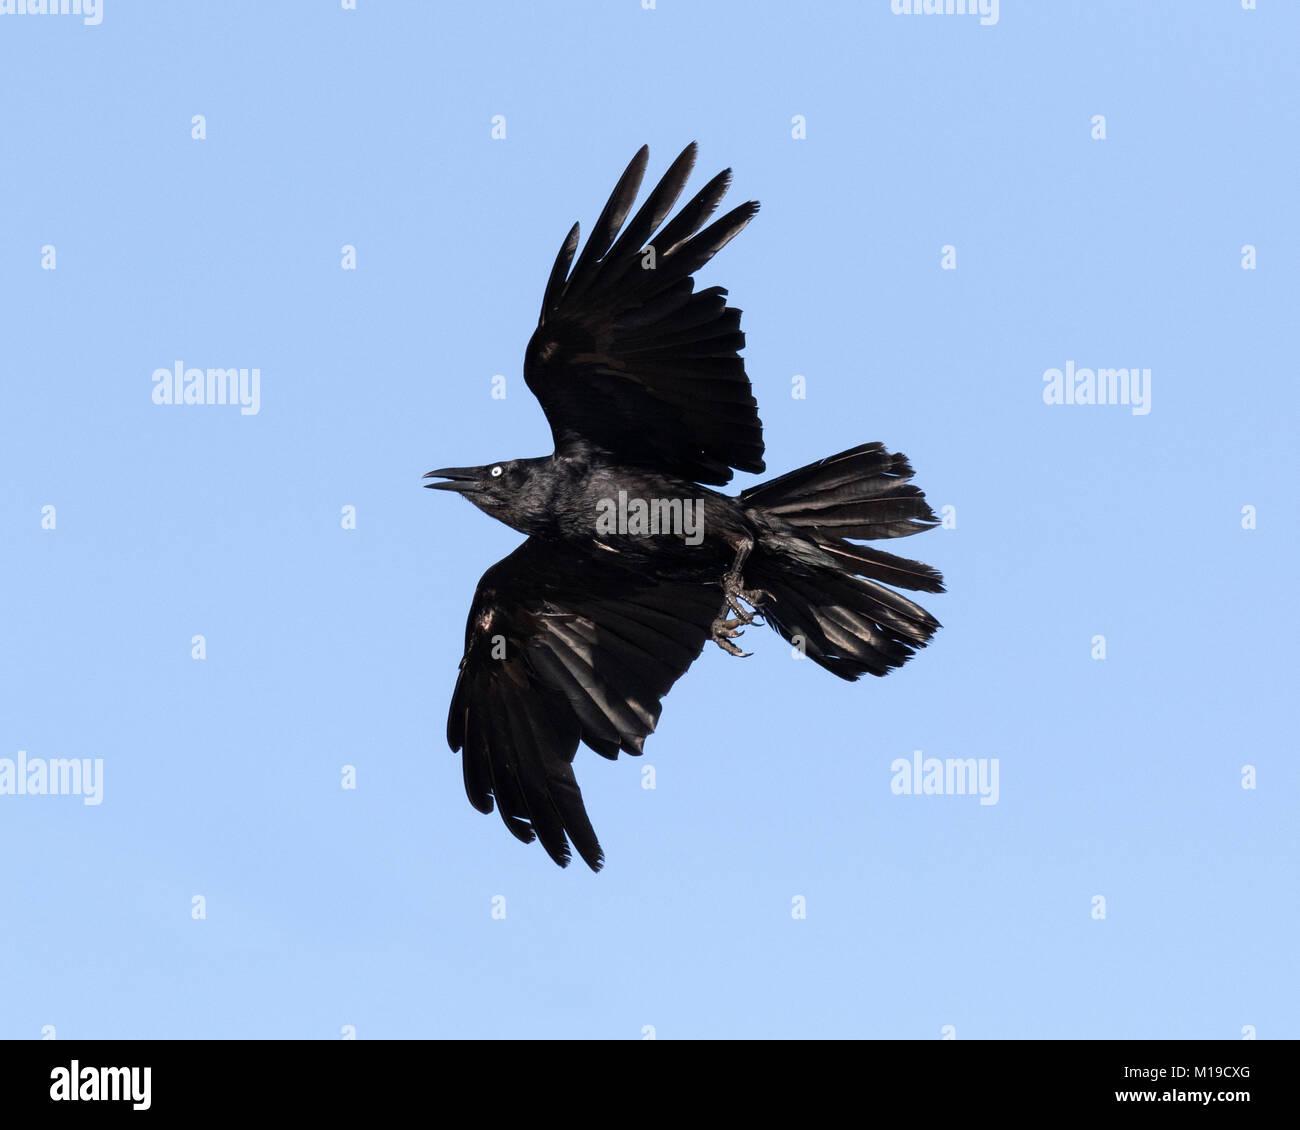 An Australian raven (Corvus coronoides) in flight over Rottnest Island, Perth, Western Australia - Stock Image